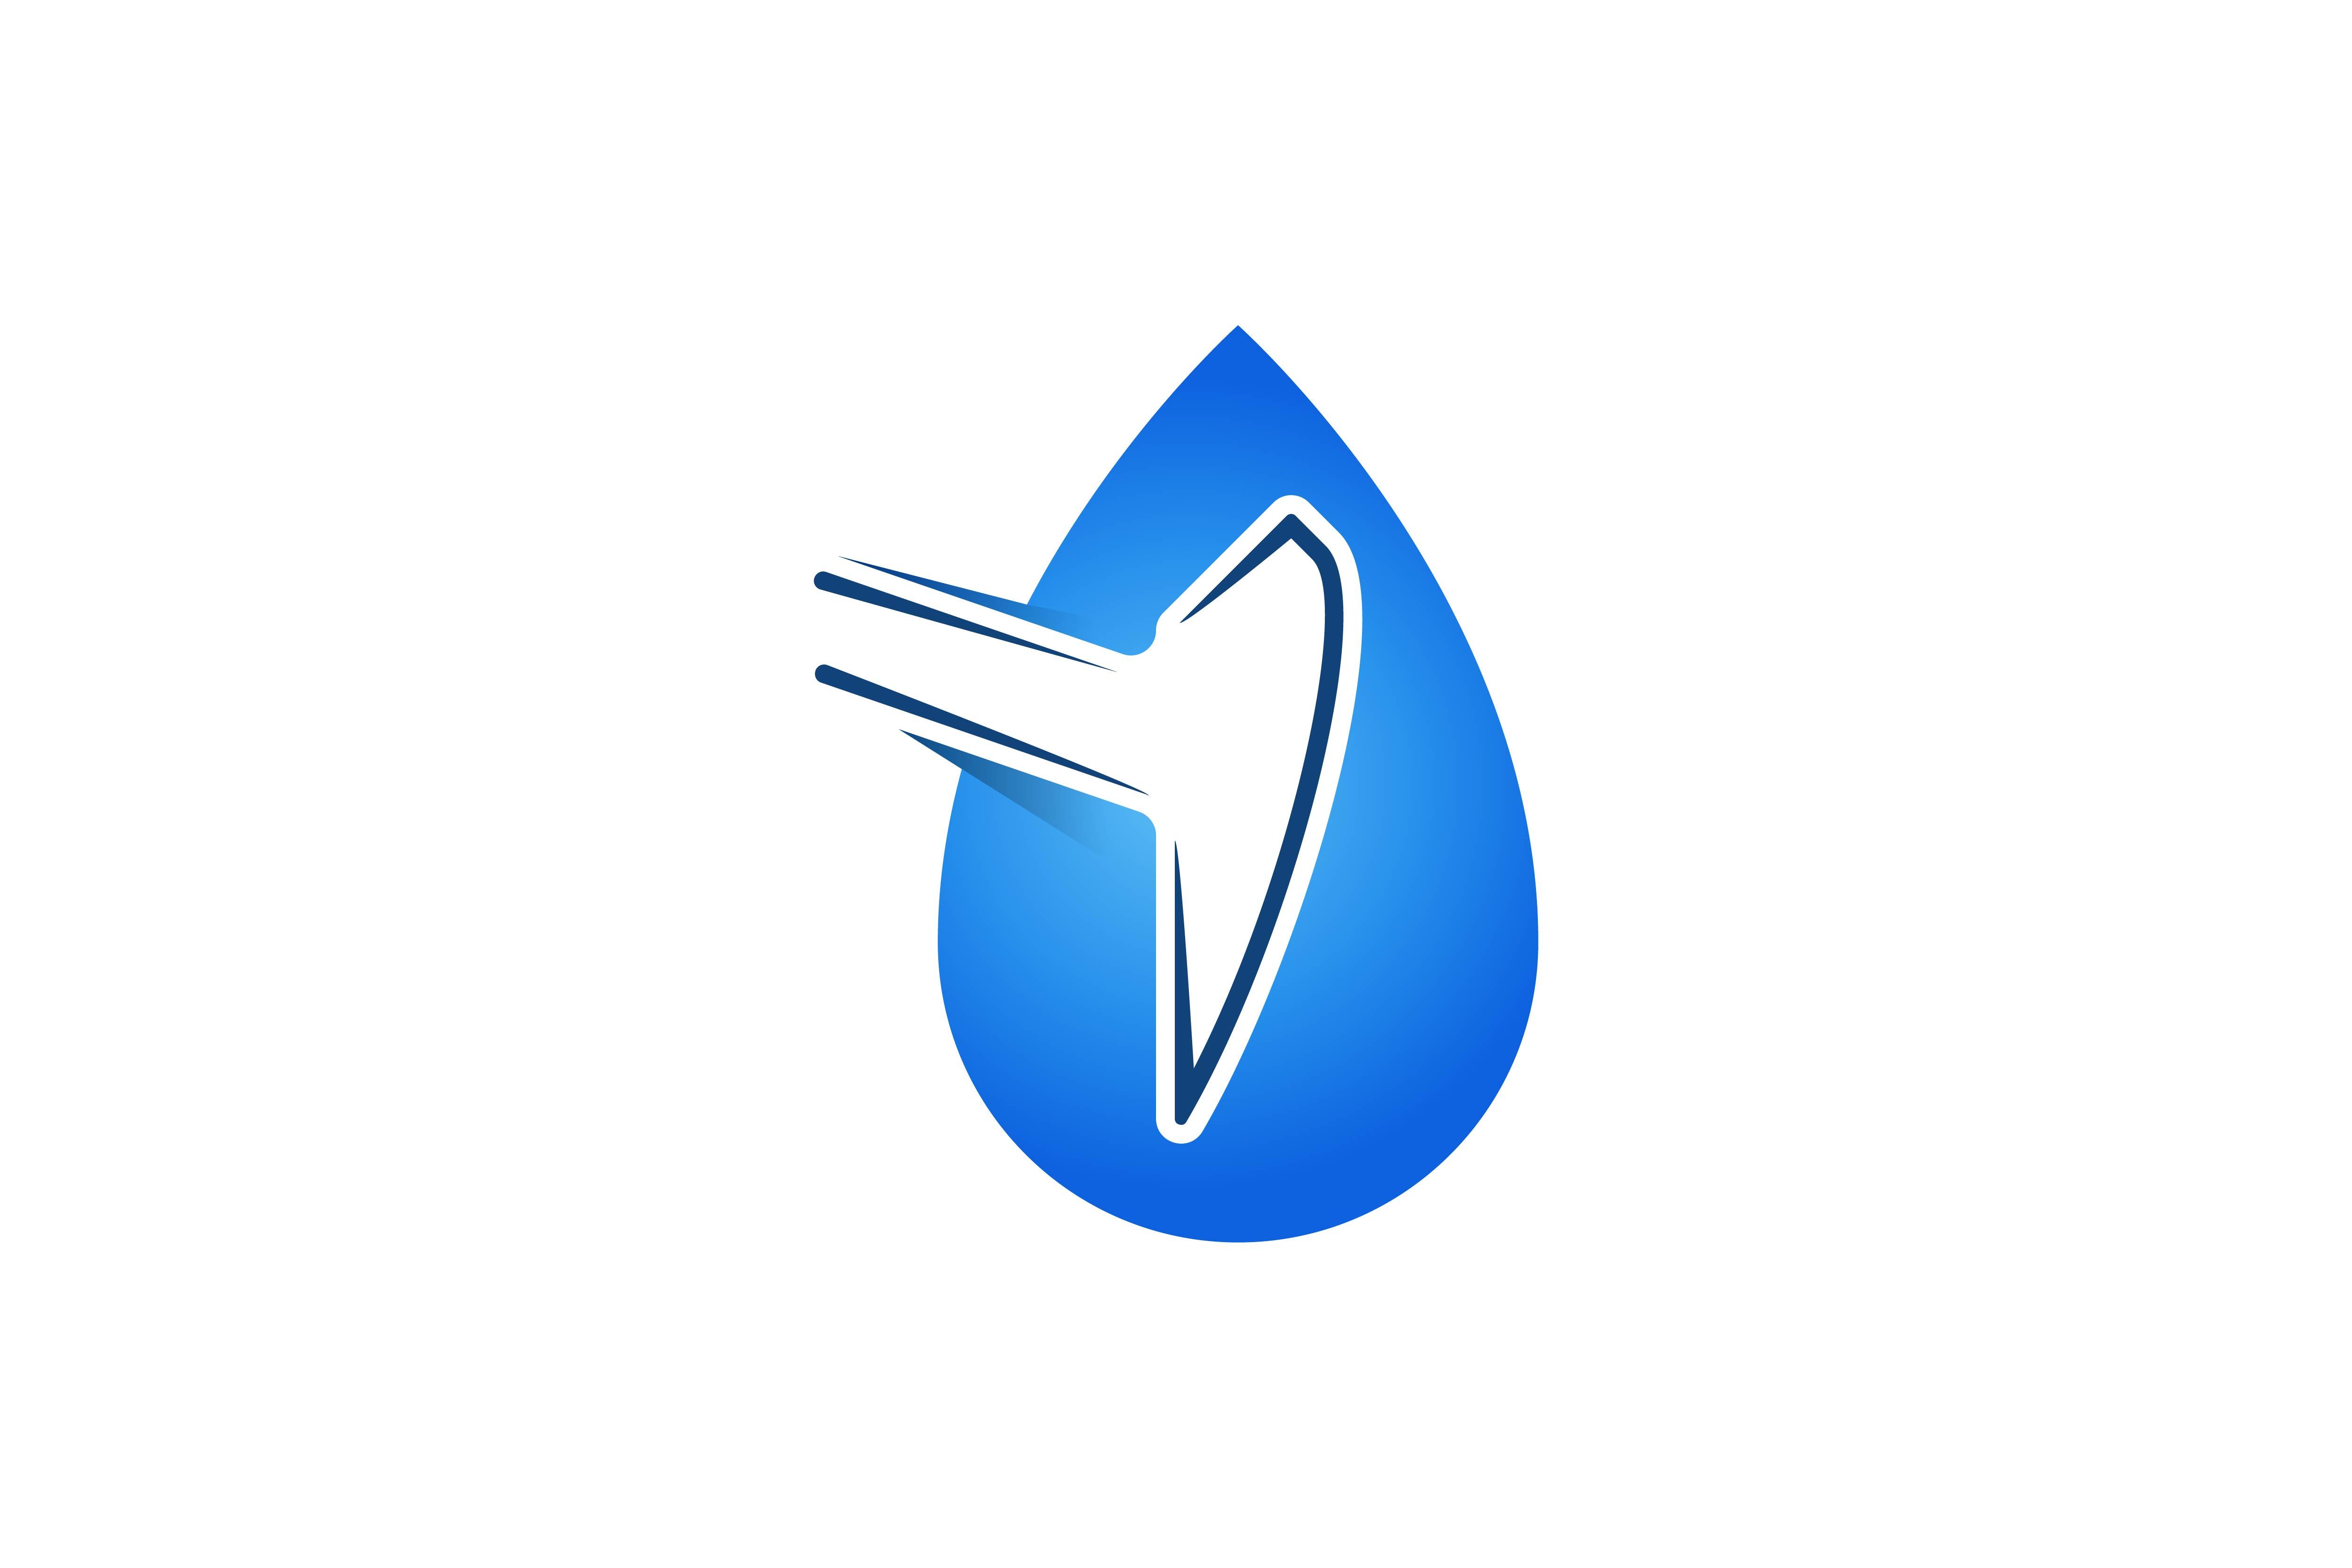 oil drop mining logo